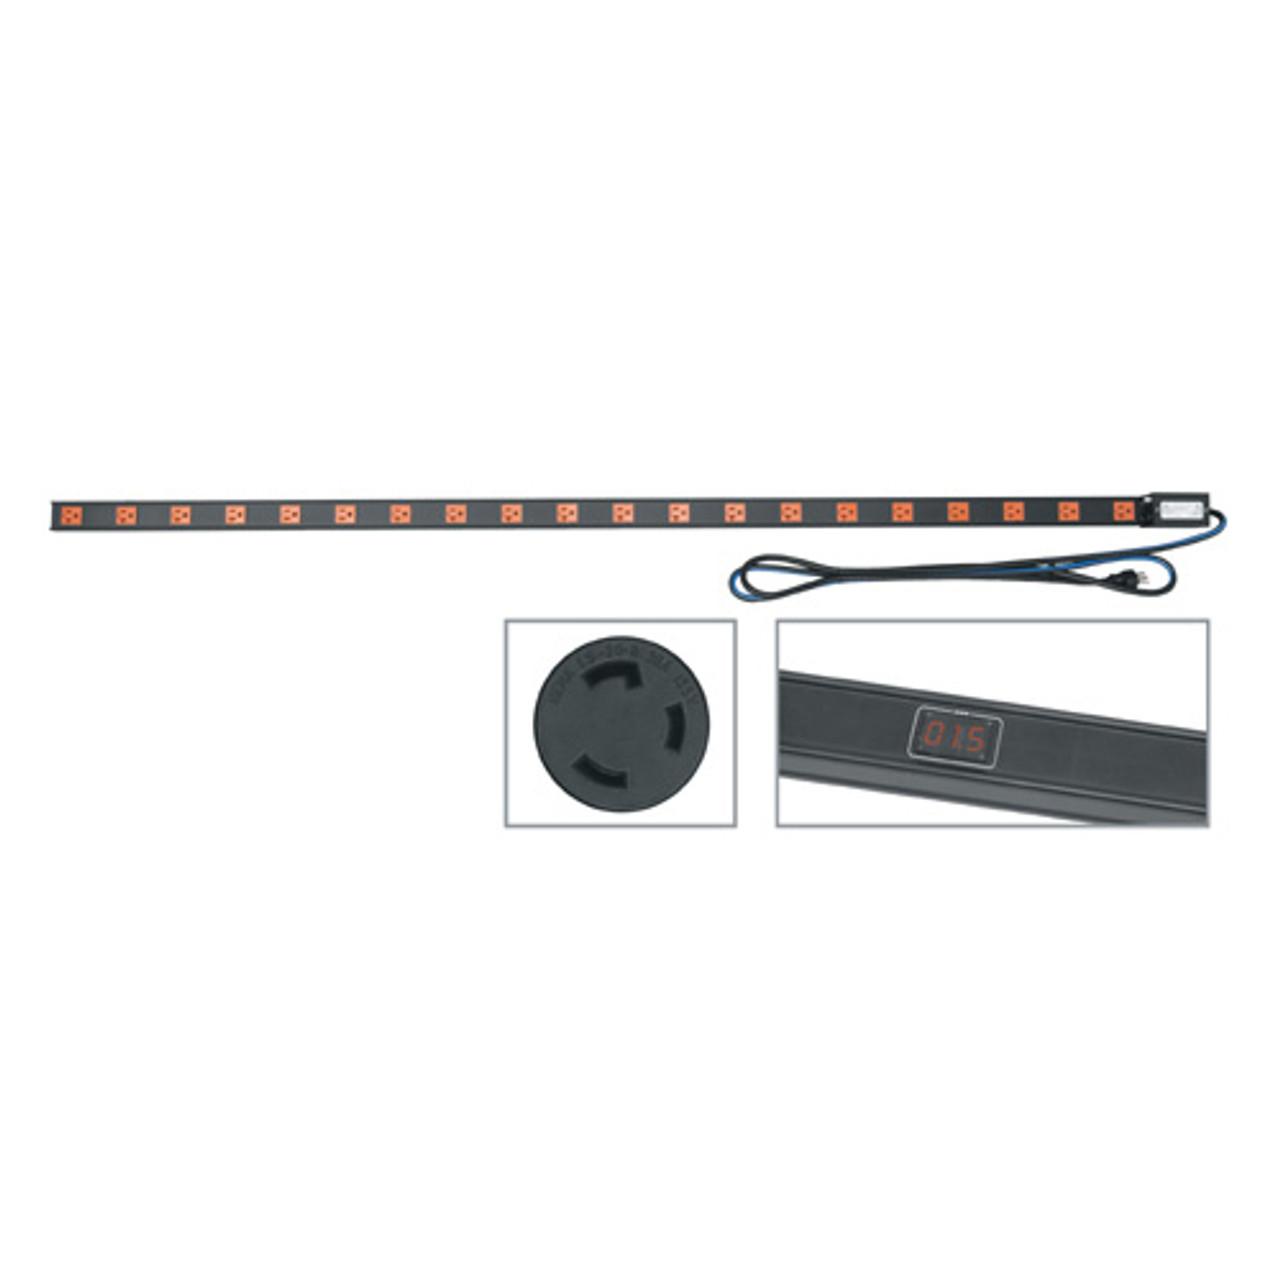 20 AMP Vertical Power Strip, 20 Outlets Twistlock Plug